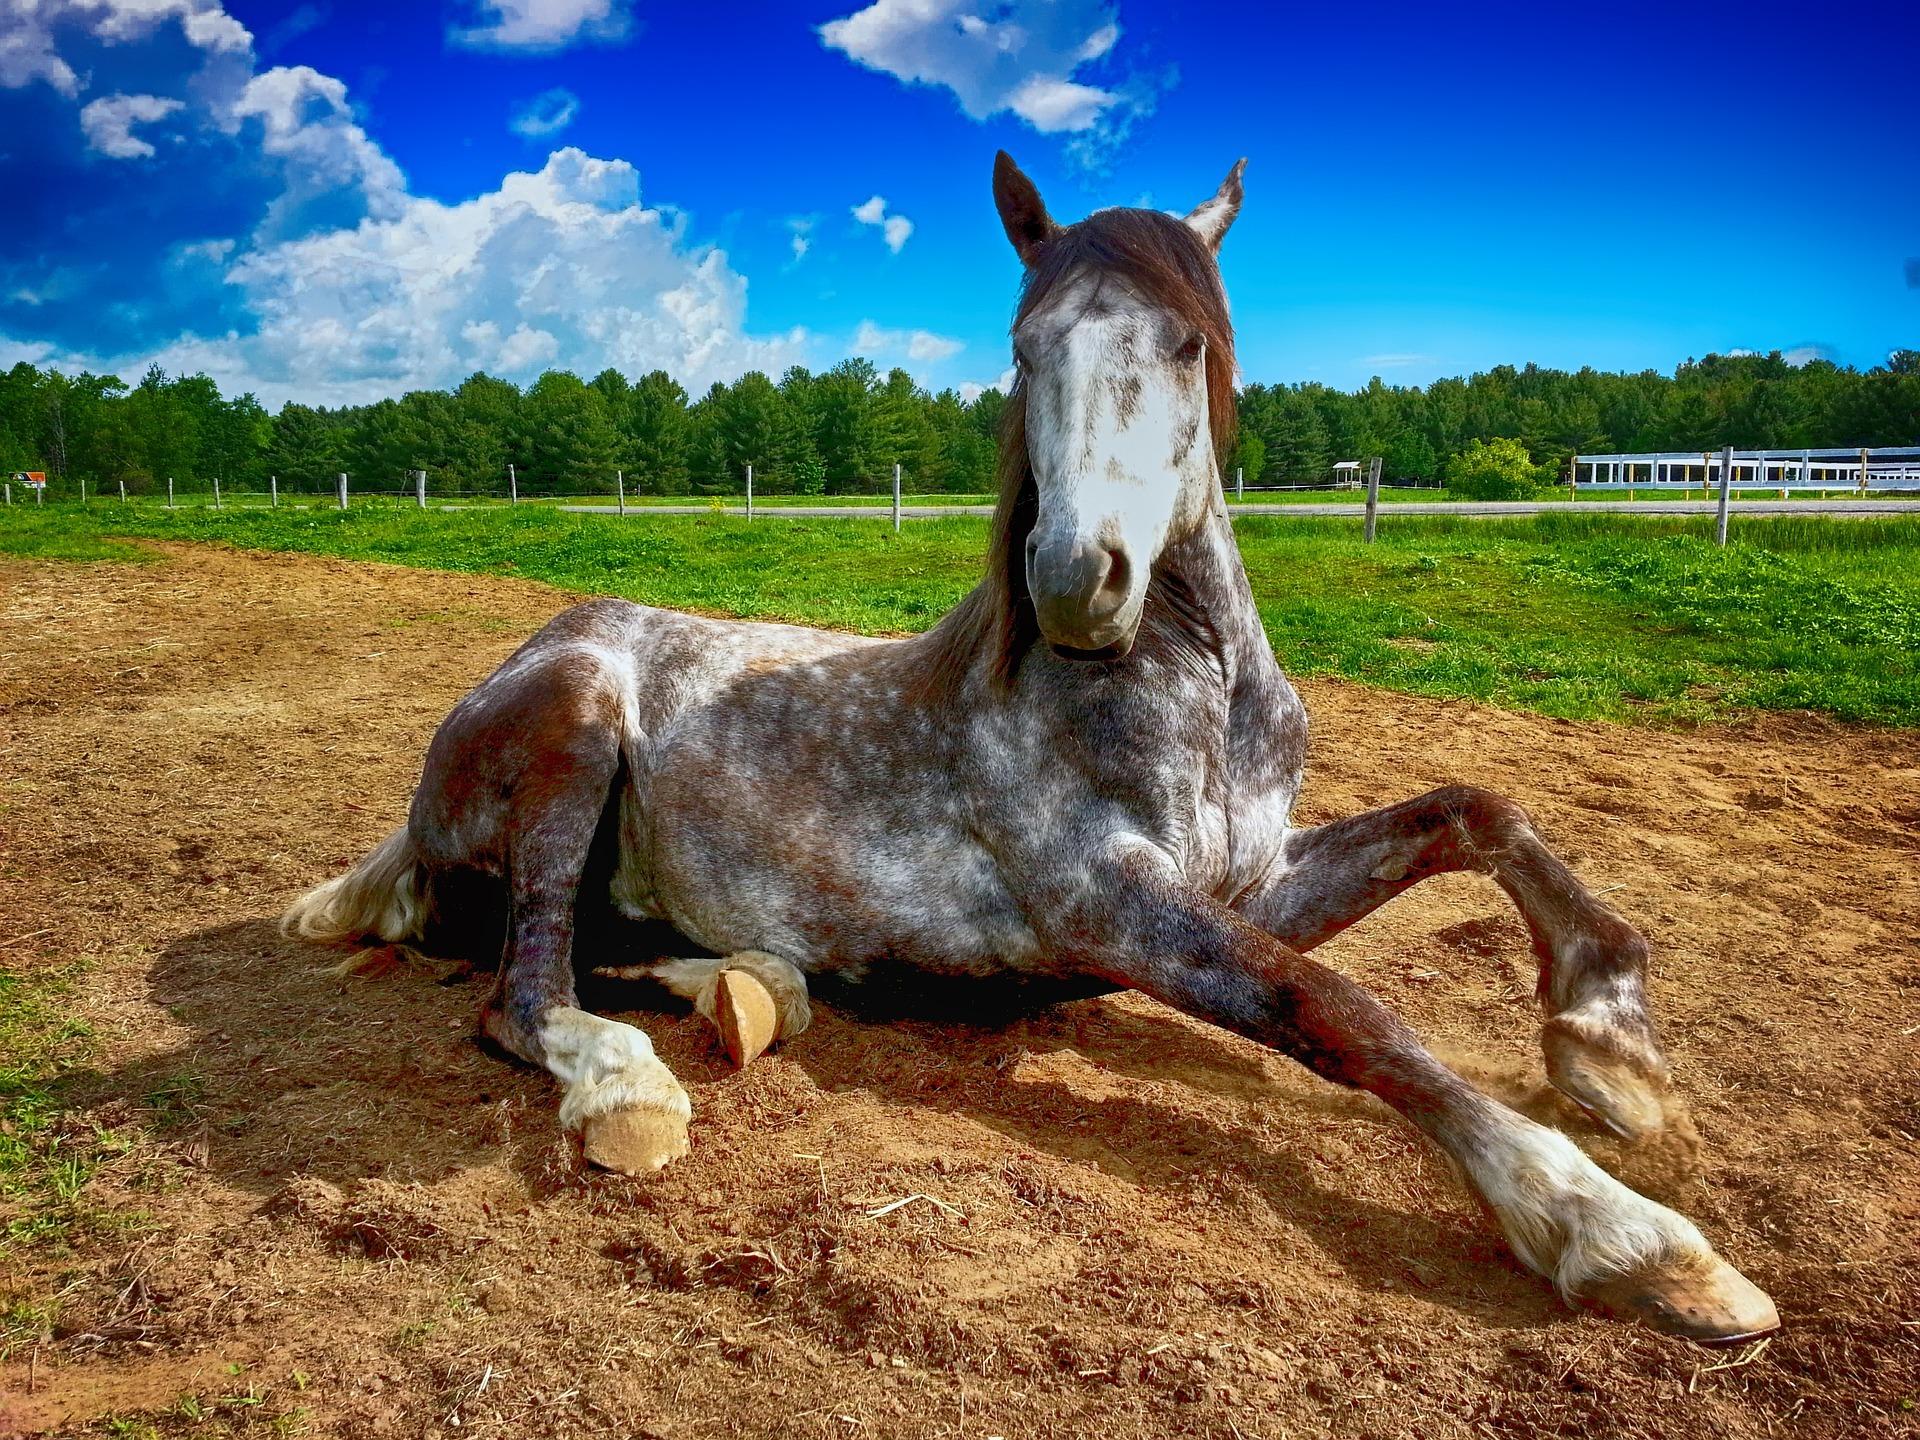 horse-2572051_1920.jpg